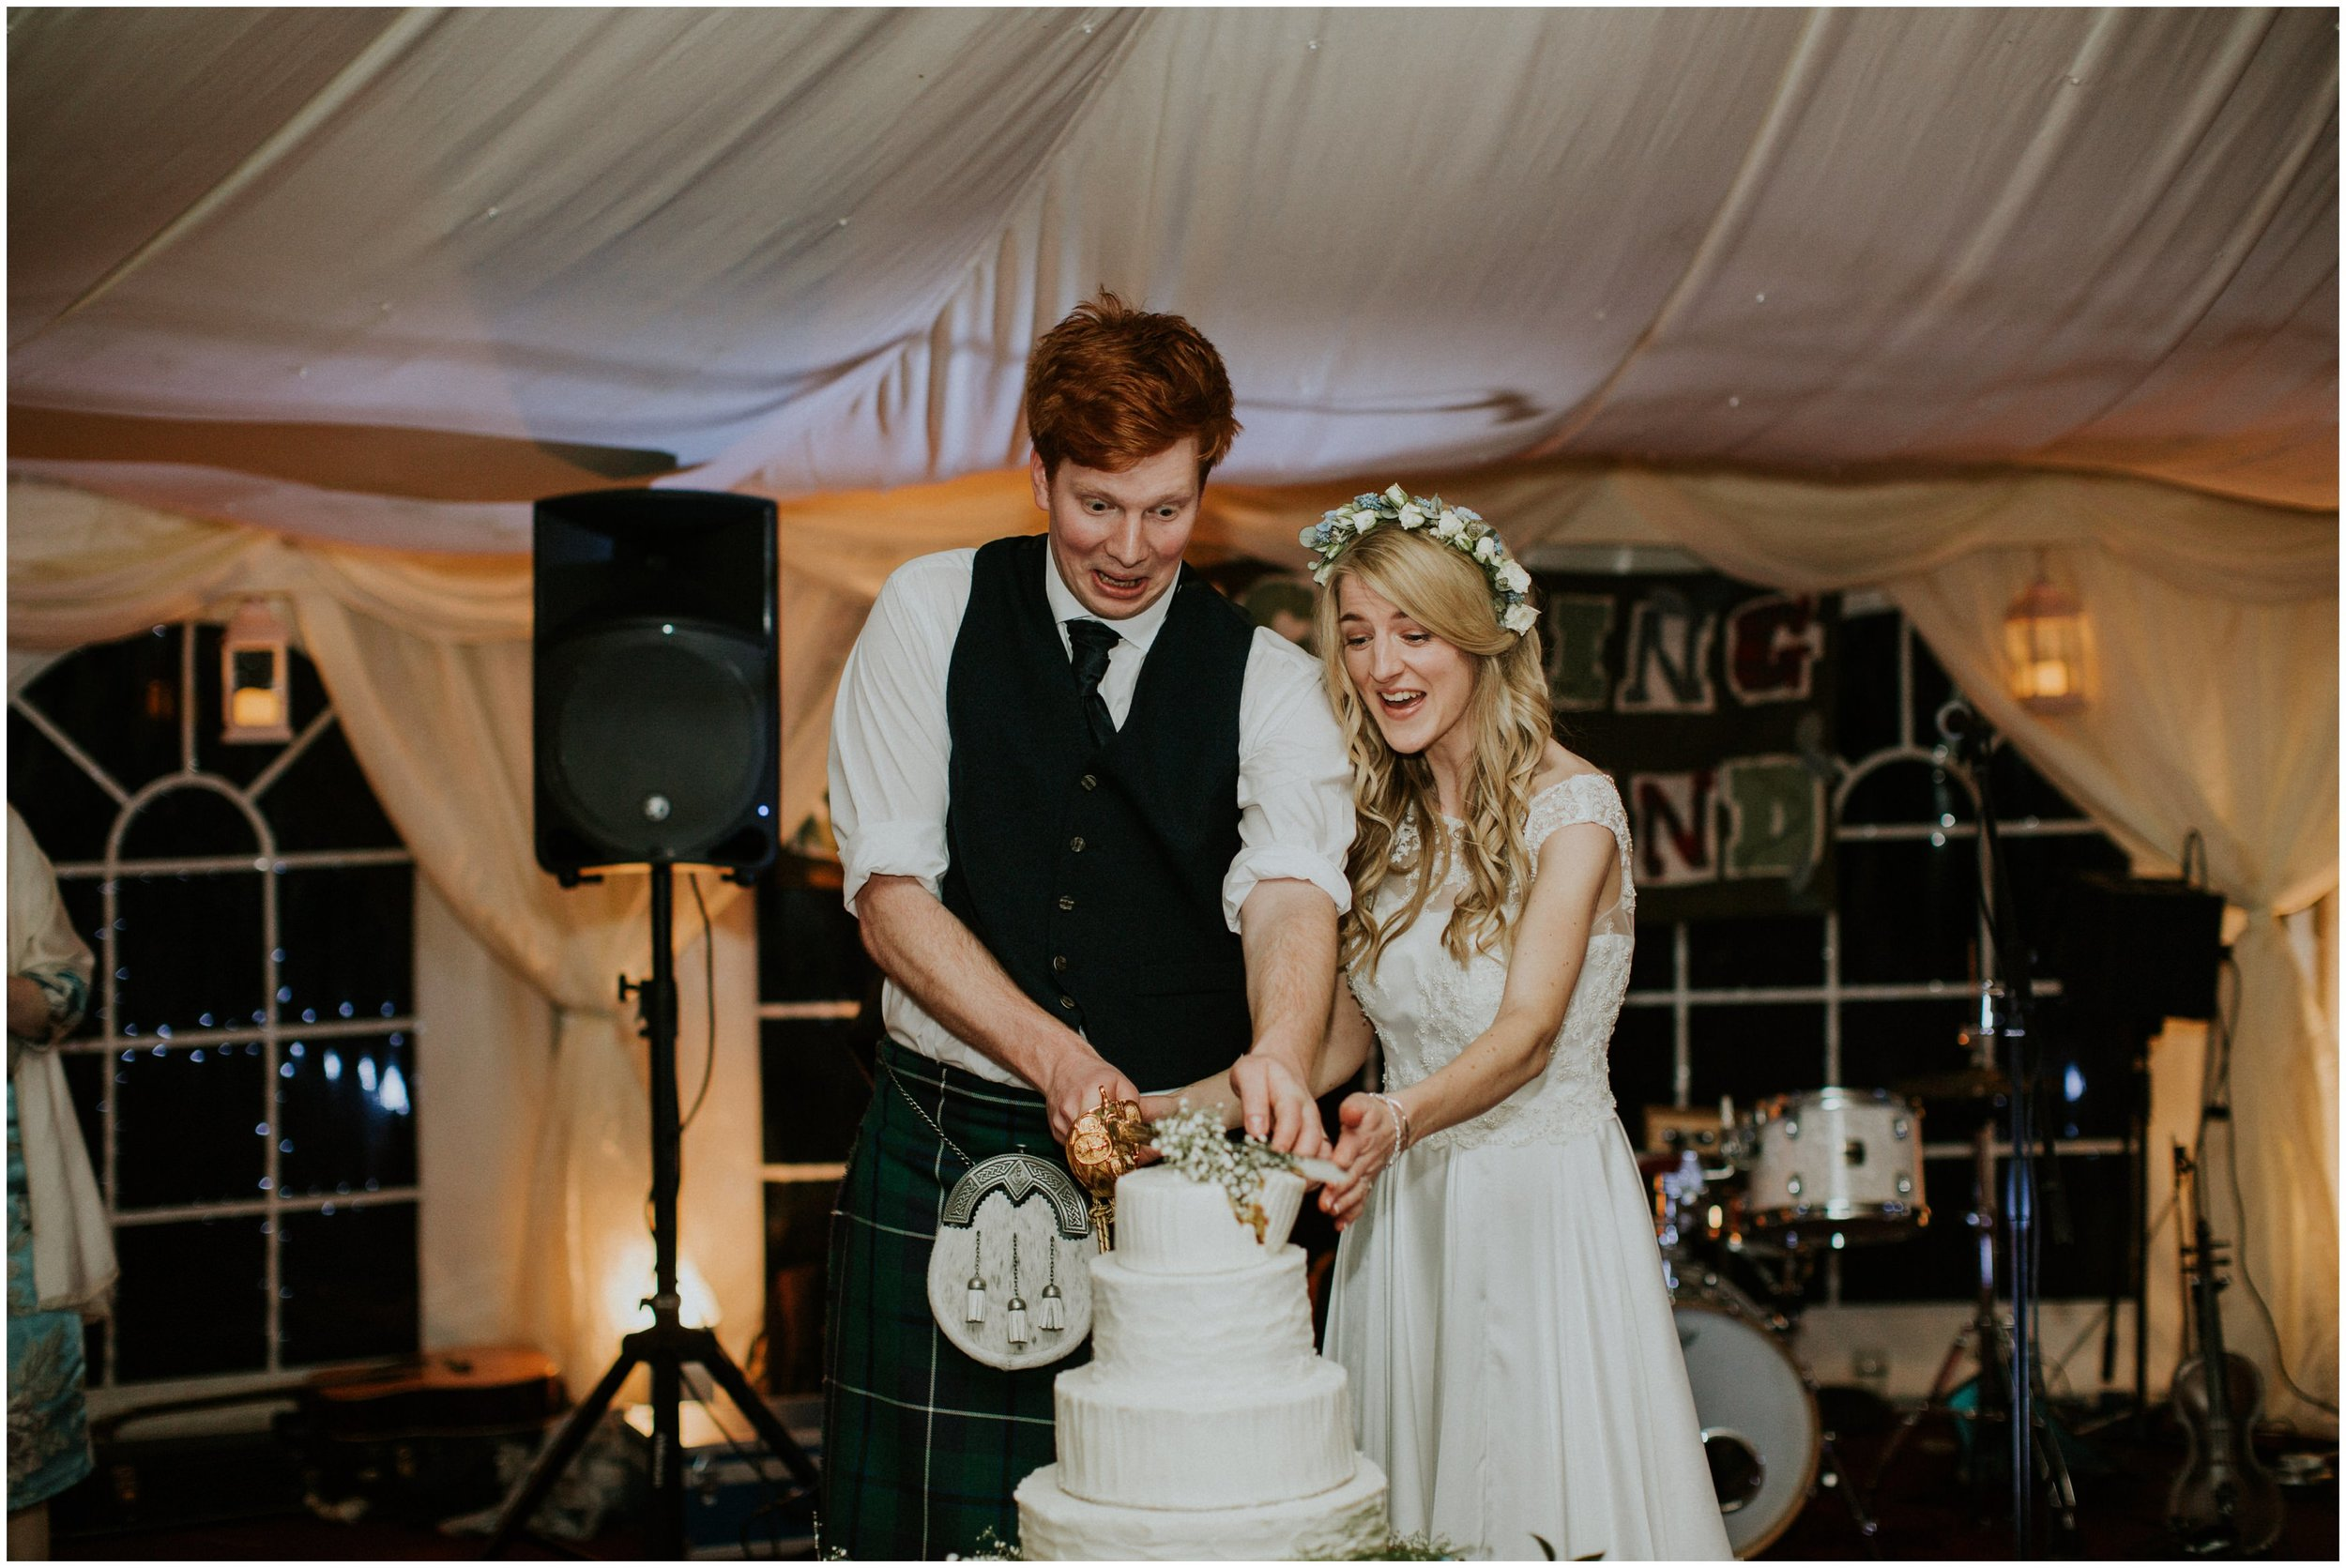 Photography 78 - Glasgow Wedding Photographer - Dave & Alana_0098.jpg